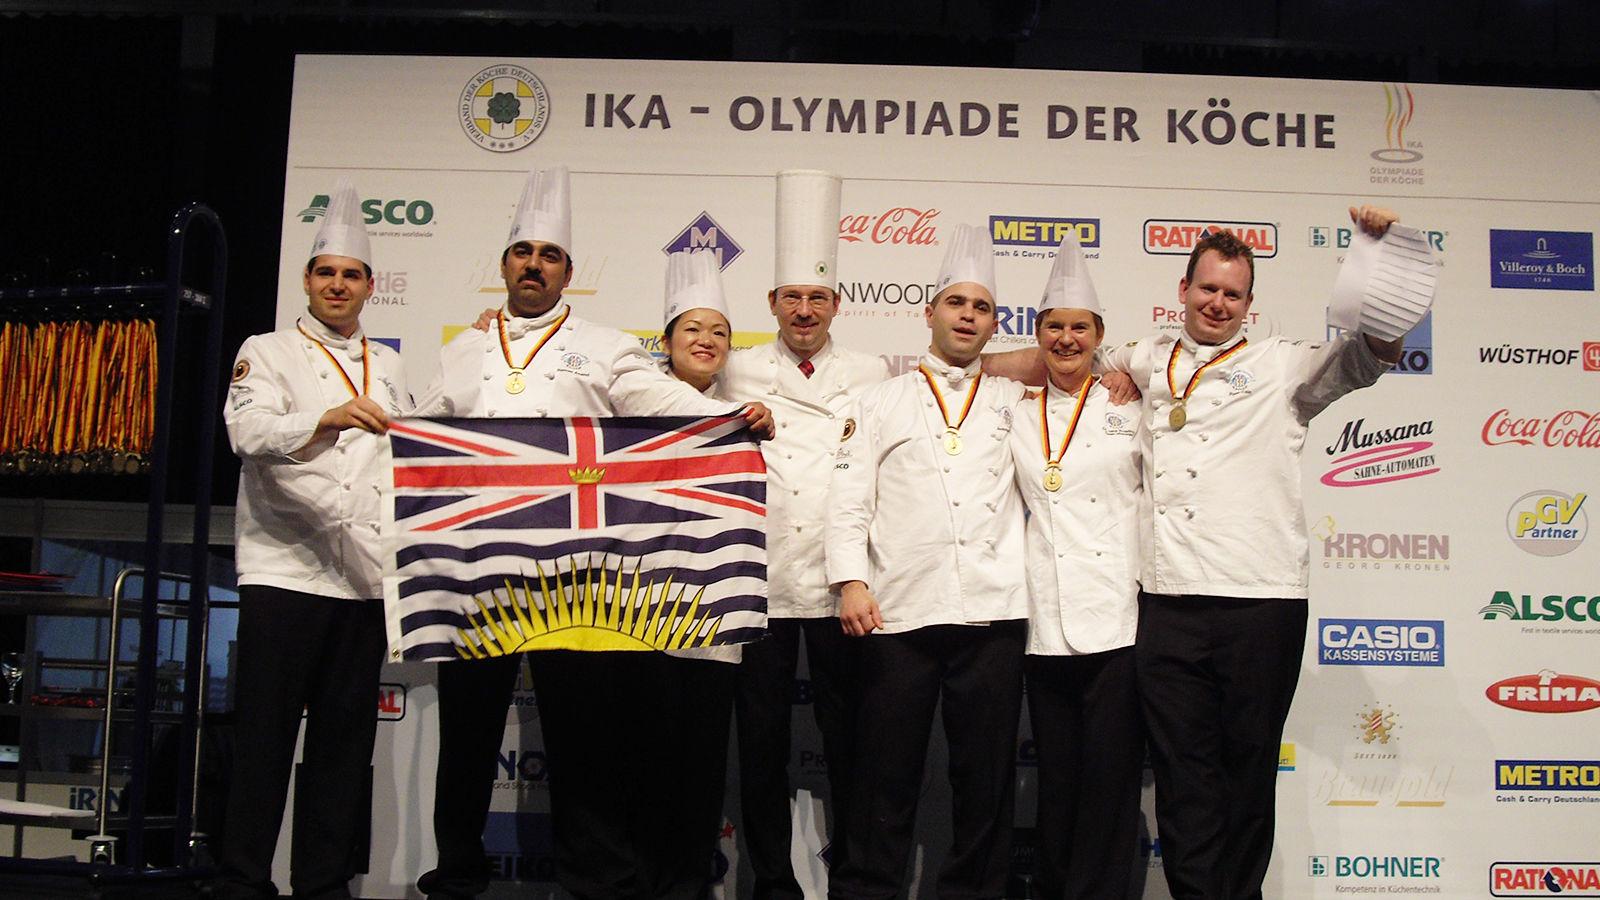 Gold Medal - 2008 Culinary Team British Columbia - World Culinary Olympics